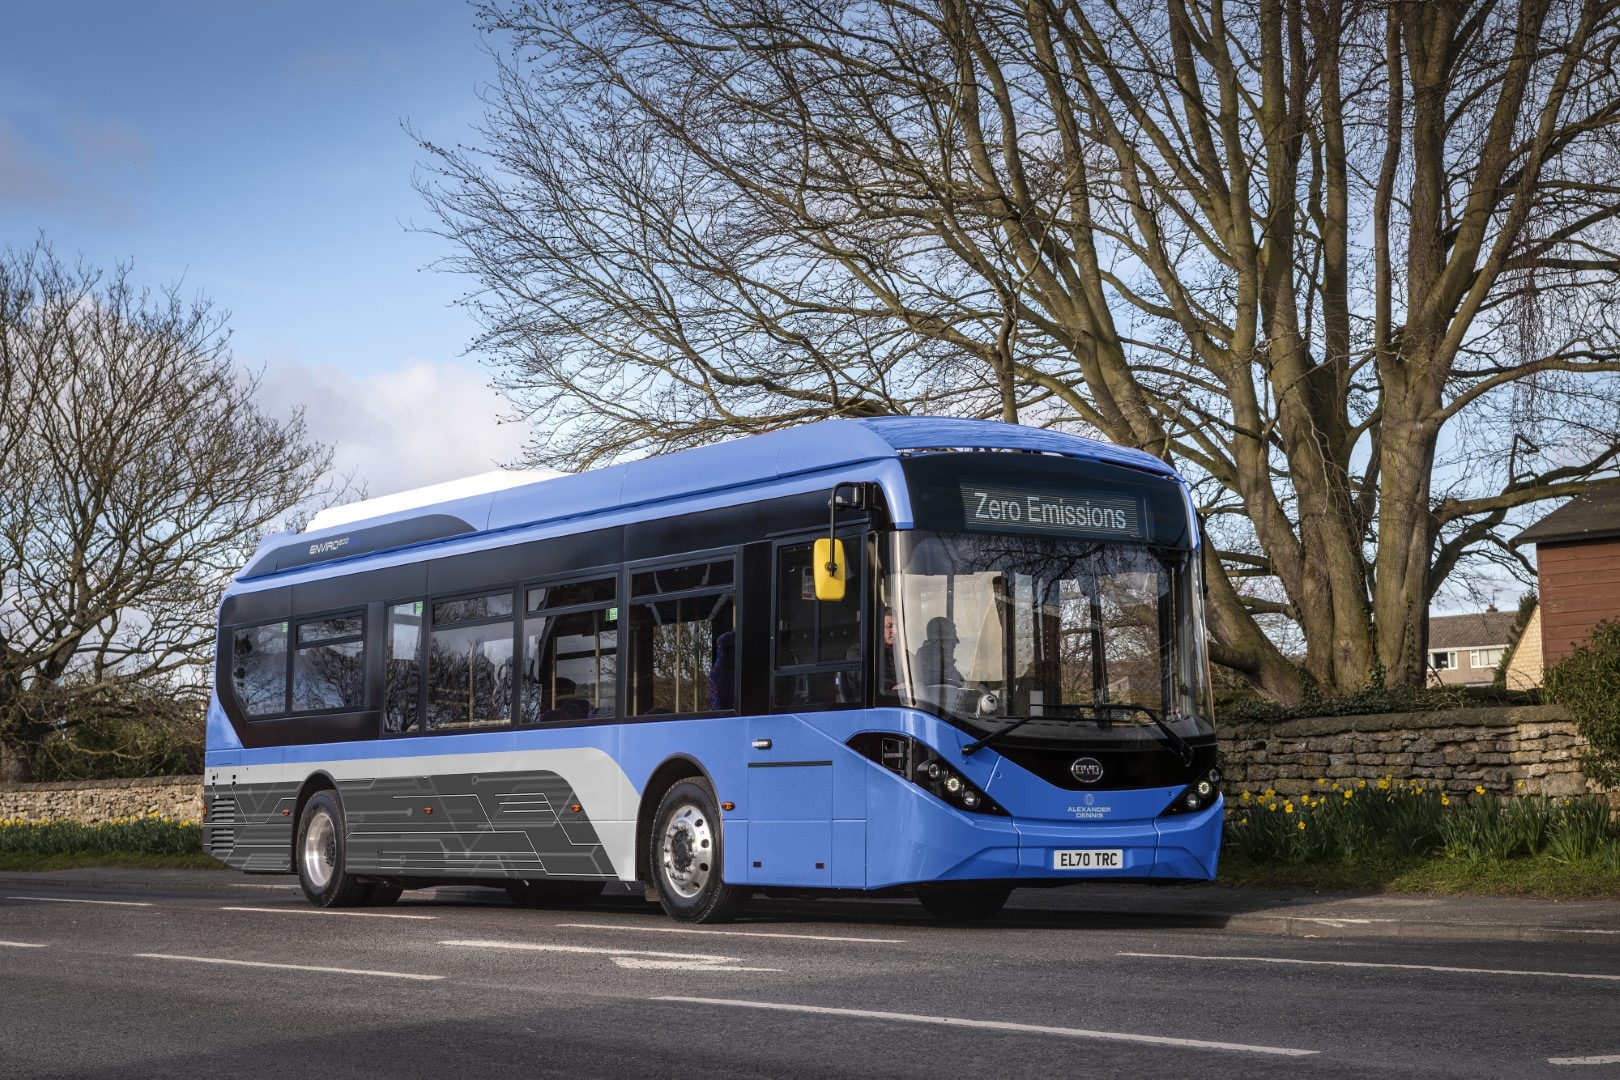 4000 zero-emission buses